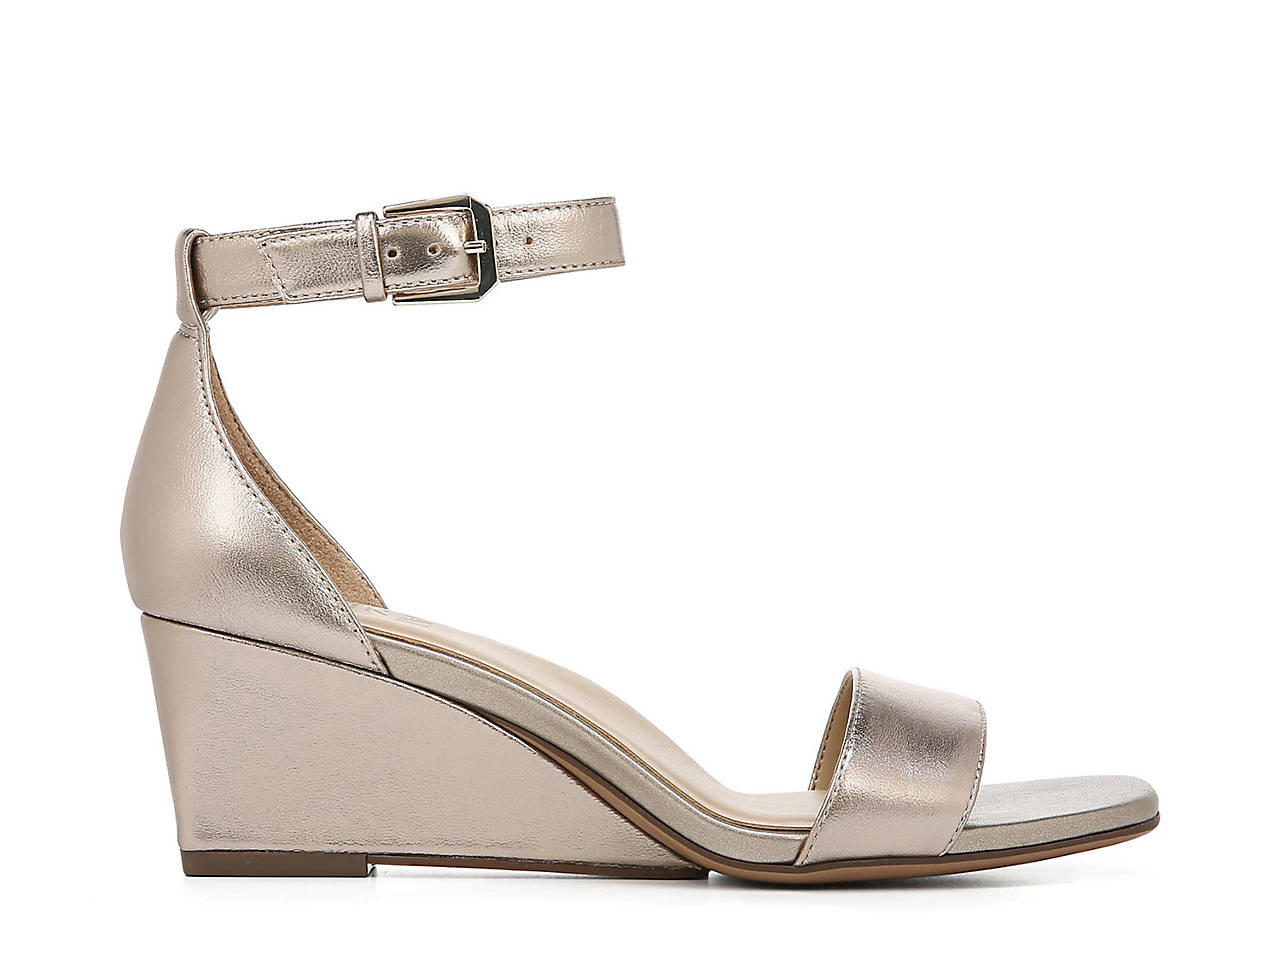 Naturalizer Womens Zenia Pump Platforms Wedges Sandals Sandals